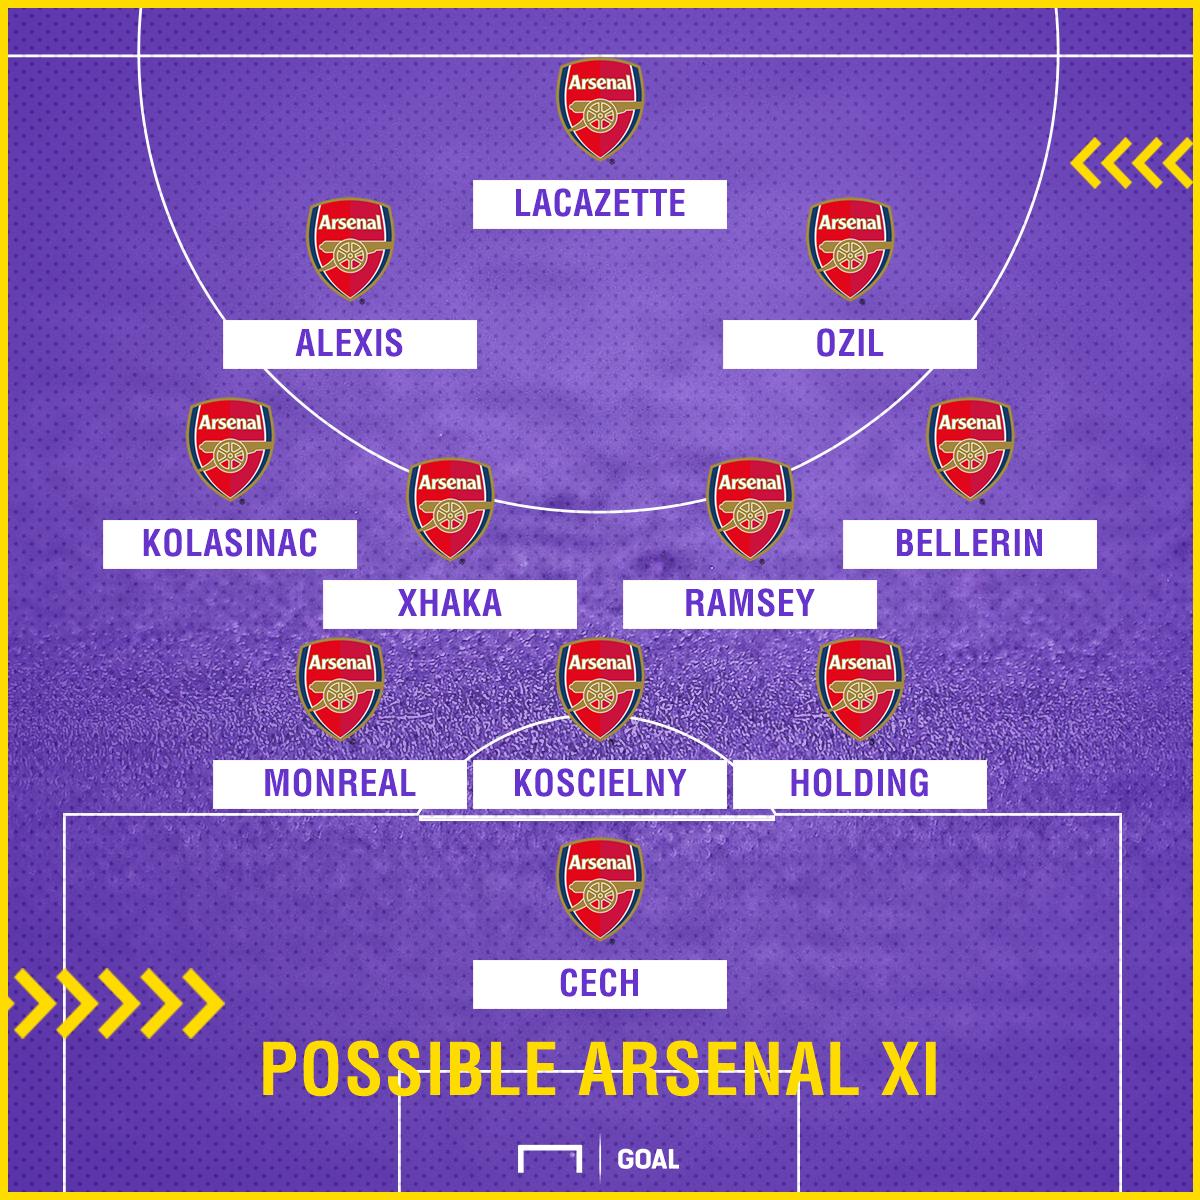 Possible Arsenal XI